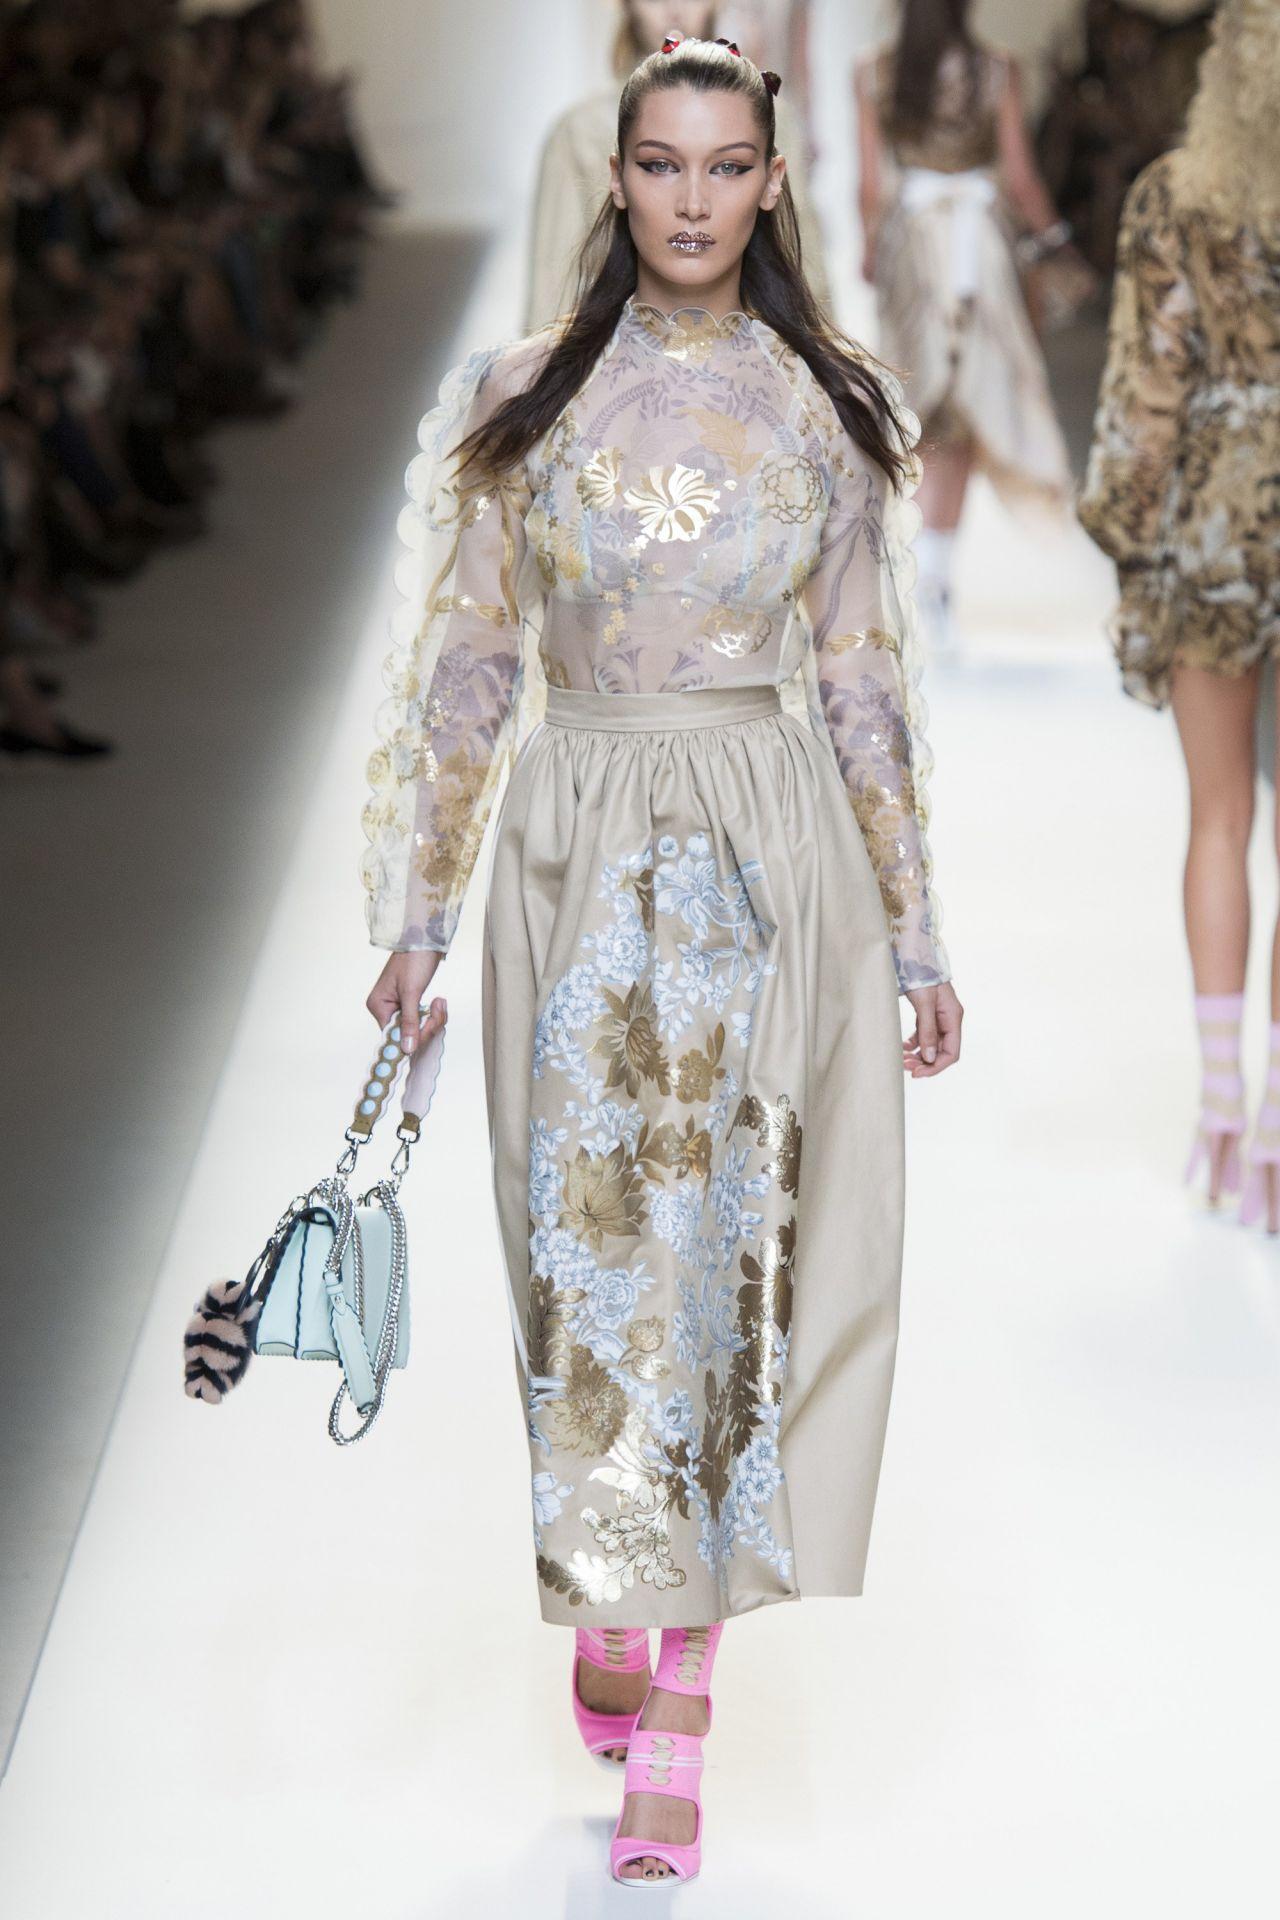 Fashion Latest Gul Ahmed Summer Designs: Fendi Show At Milan Fashion Week, September 2016